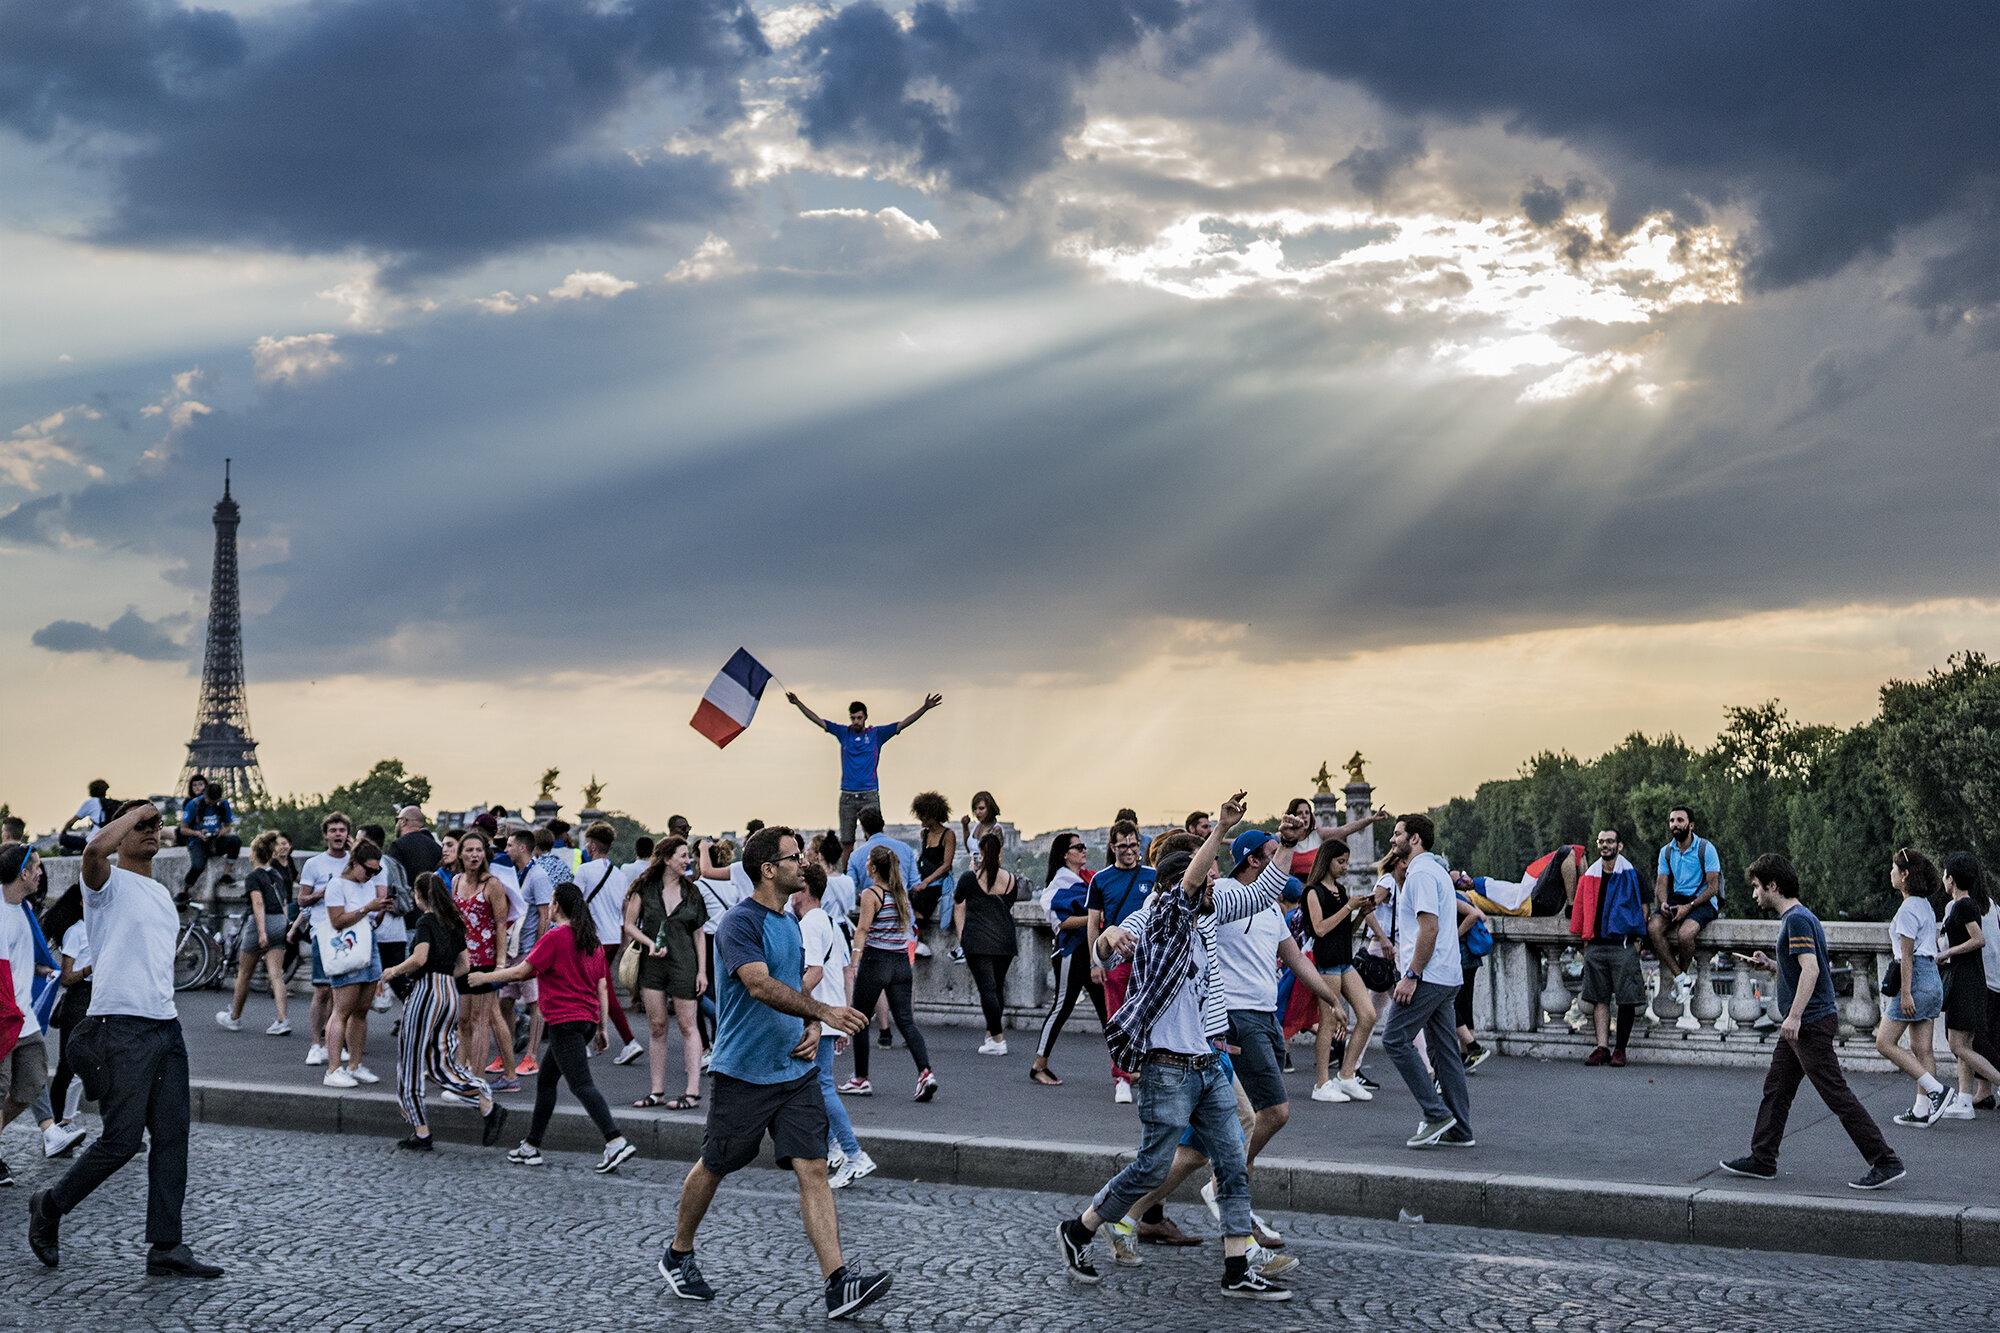 Paris_Street_2018_Flag_Waving_On_Bridge-005crp.jpg